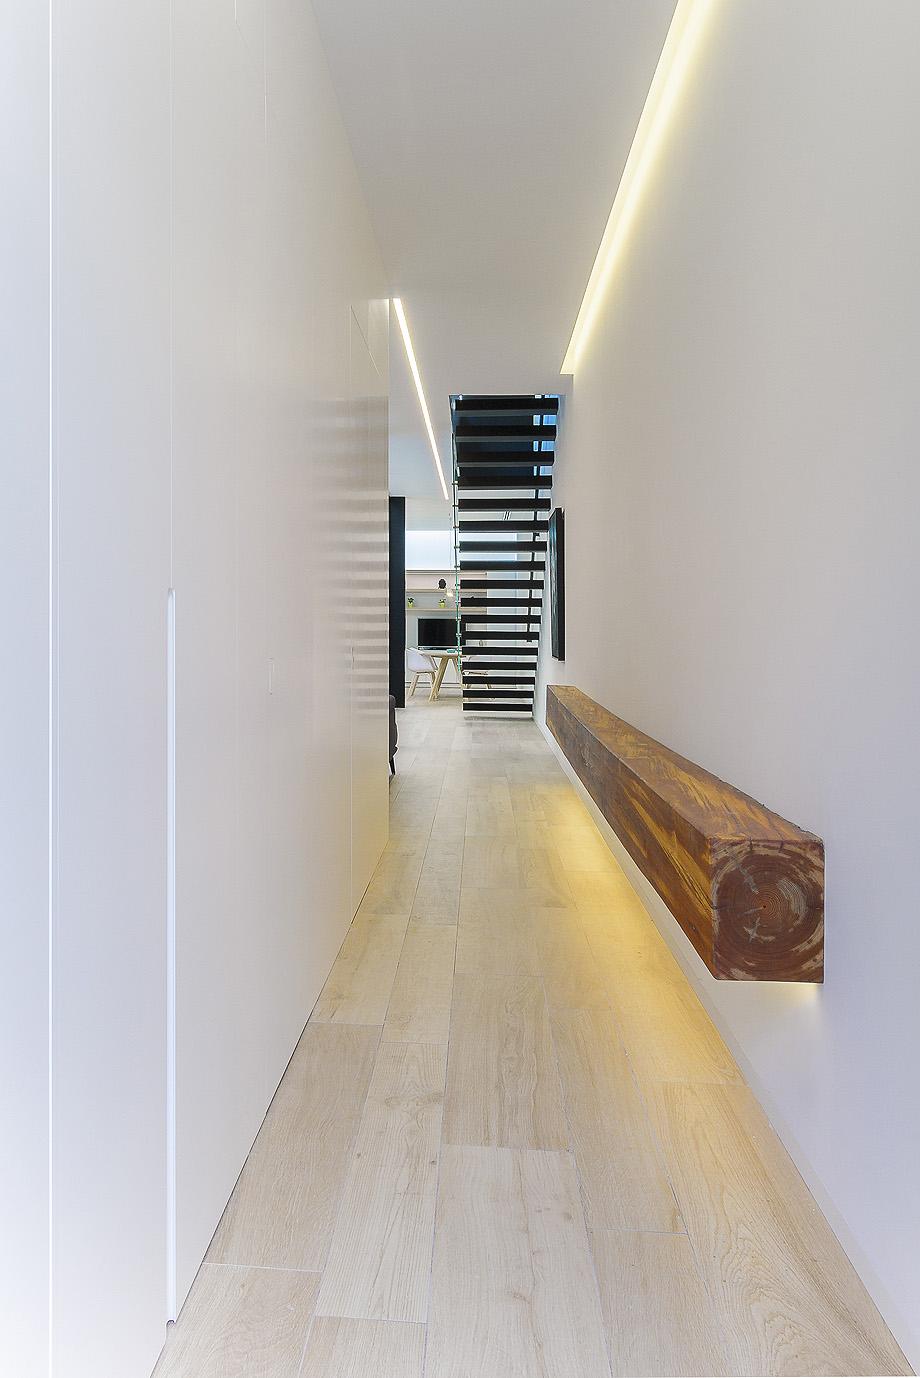 calaiaia de chiralt arquitectos - foto eva perez (10)